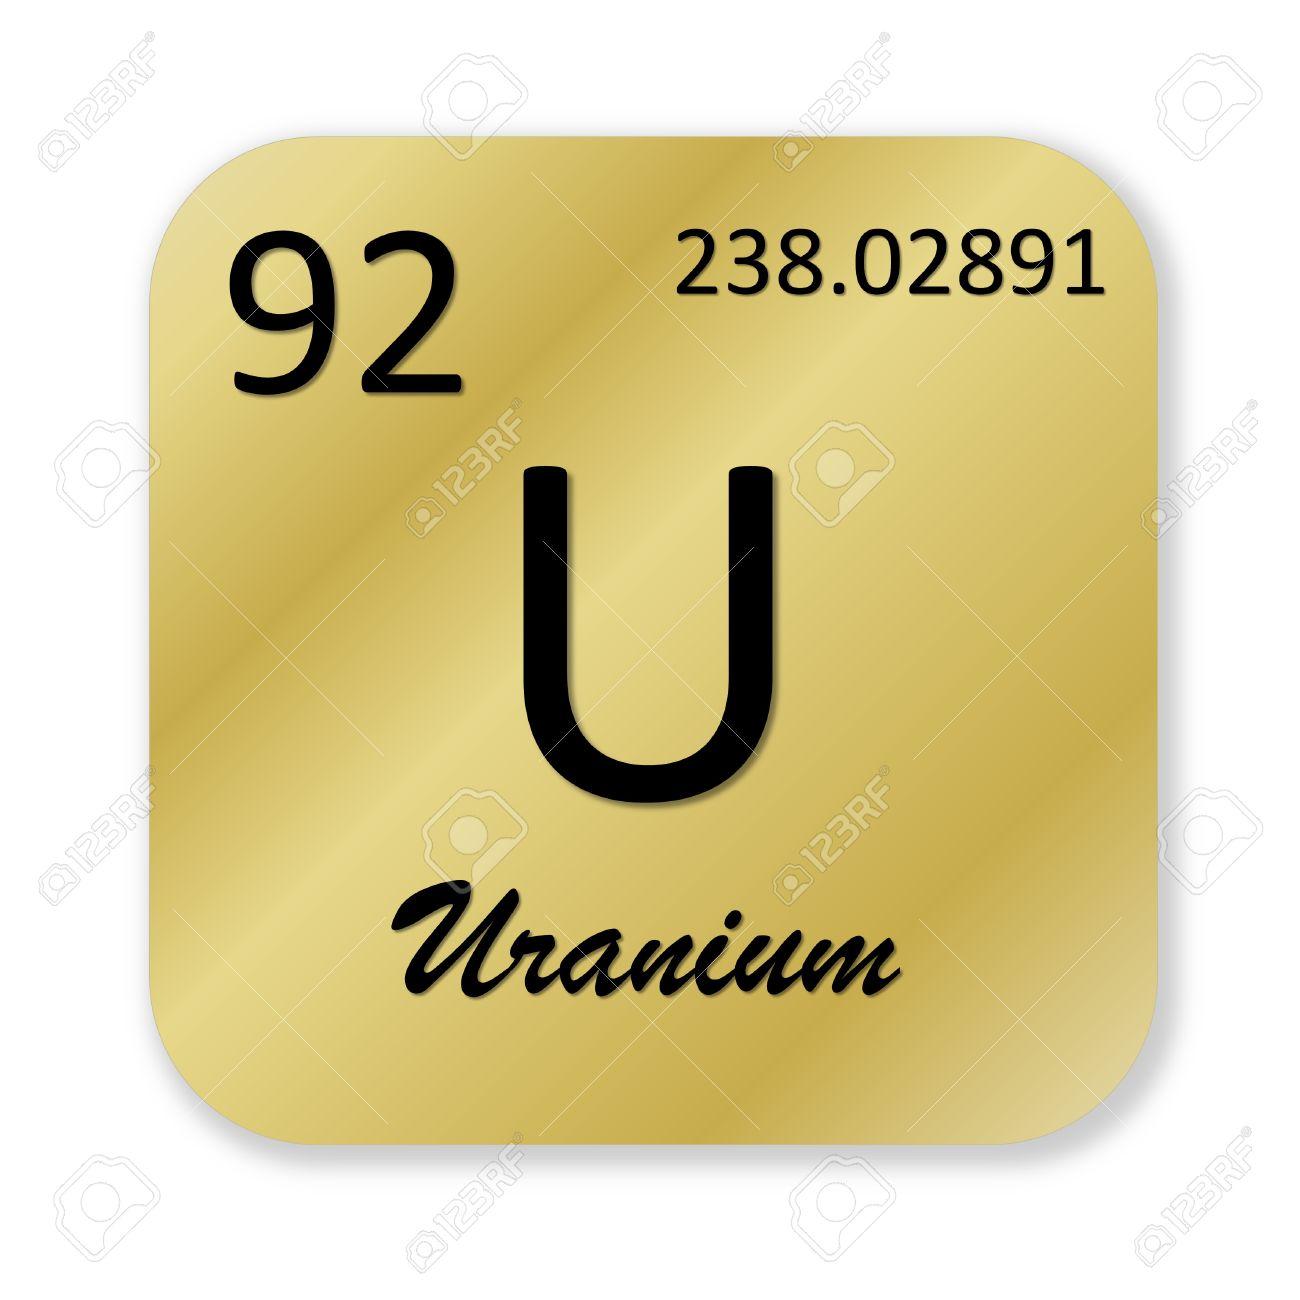 Uranium element stock photo picture and royalty free image image uranium element stock photo 30416269 buycottarizona Images